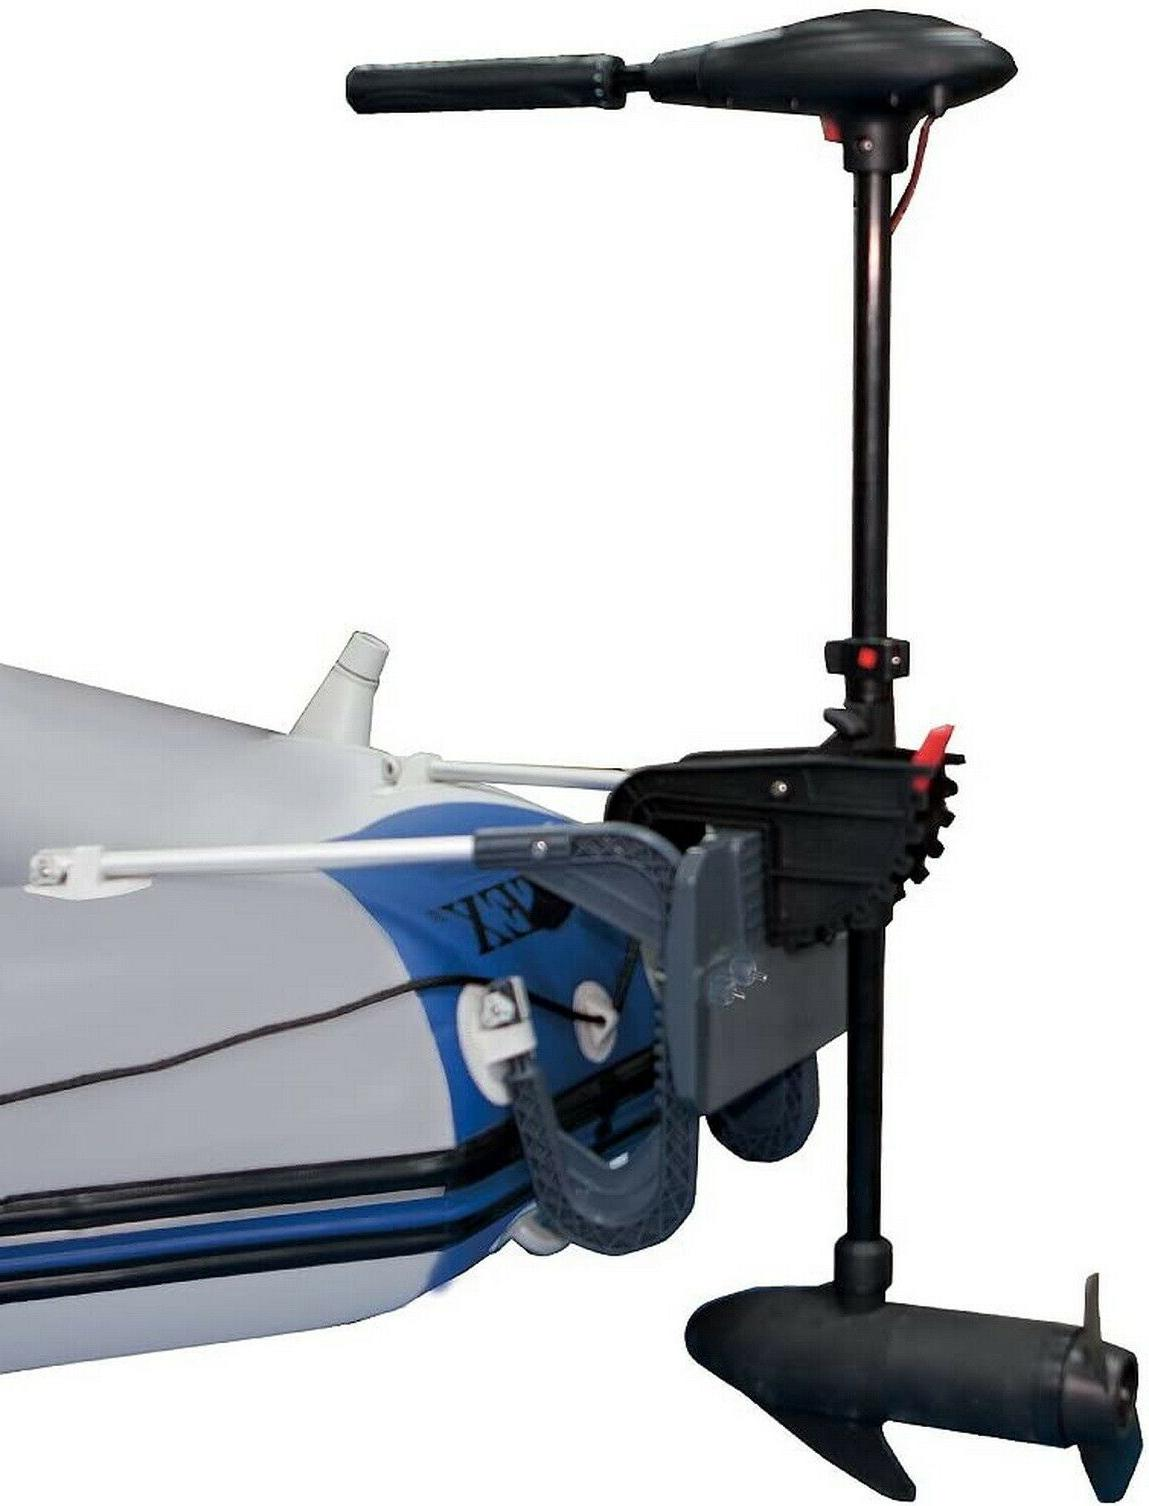 12v Trolling Motor Intex Outboard Fresh & Saltwater Electric